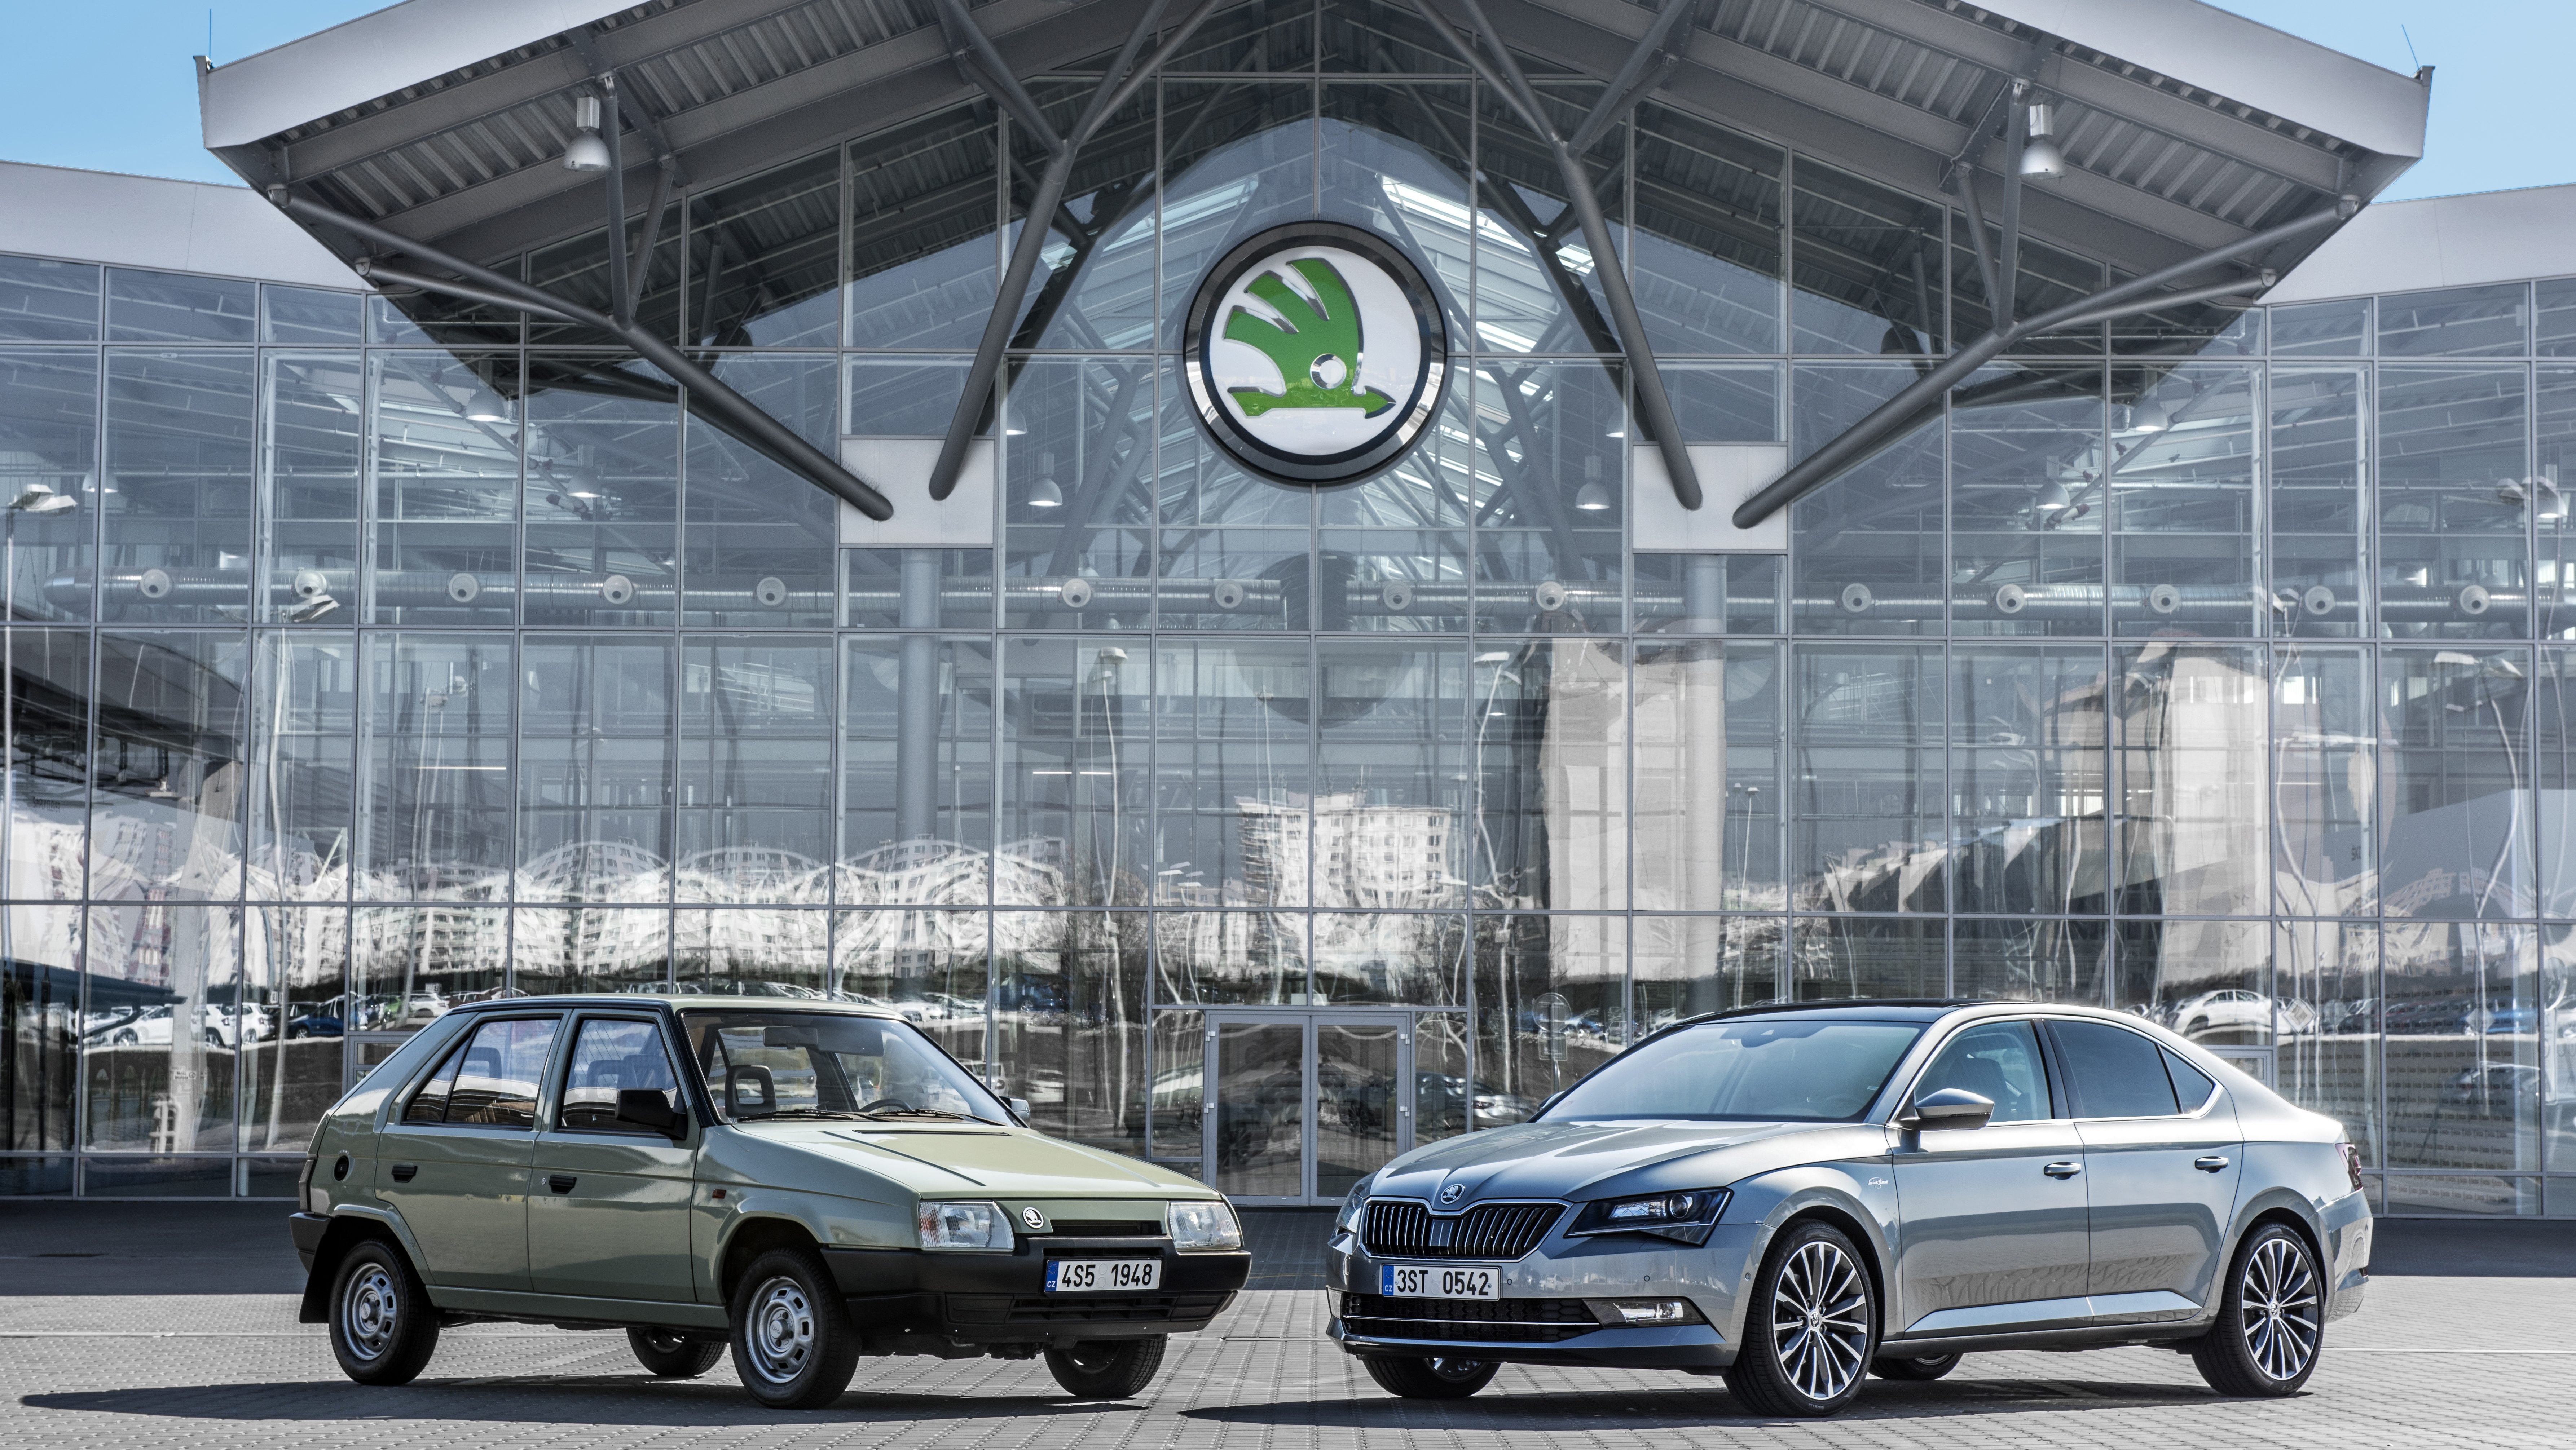 Volkswagen Group Latest Models >> A Strong Partnership 25 Years Of Skoda And Volkswagen Skoda